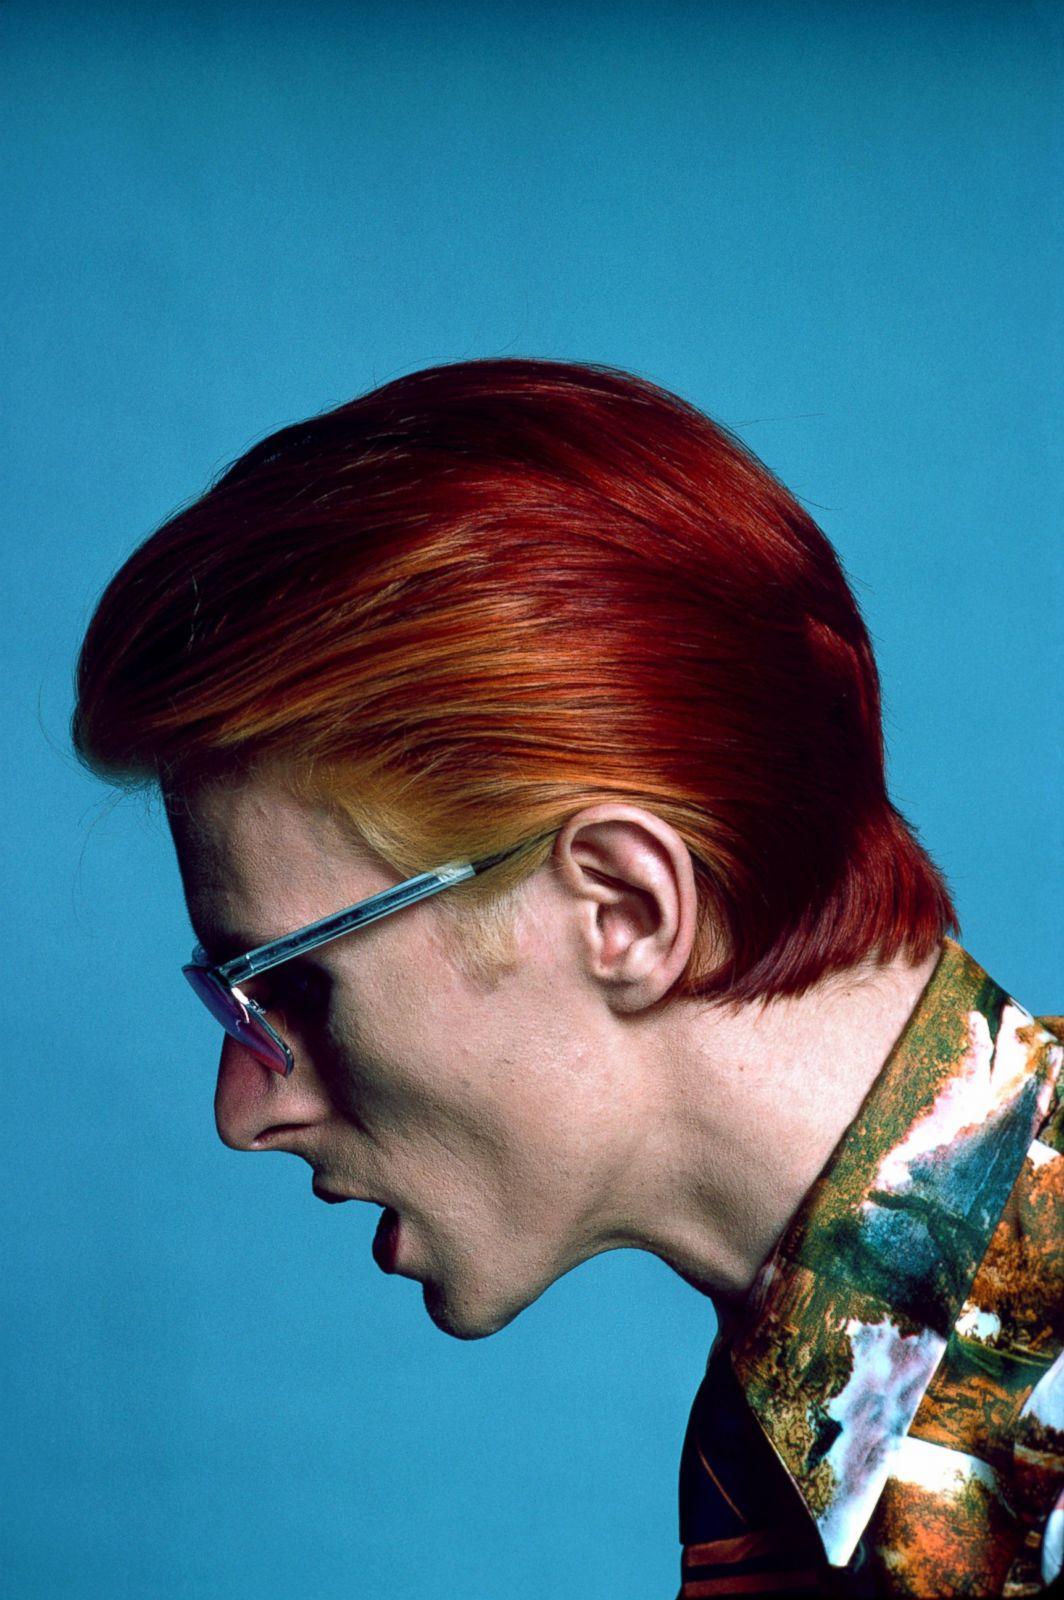 David Bowie as Tilda Swinton, and Vice Versa Open Culture David bowie photo shoot